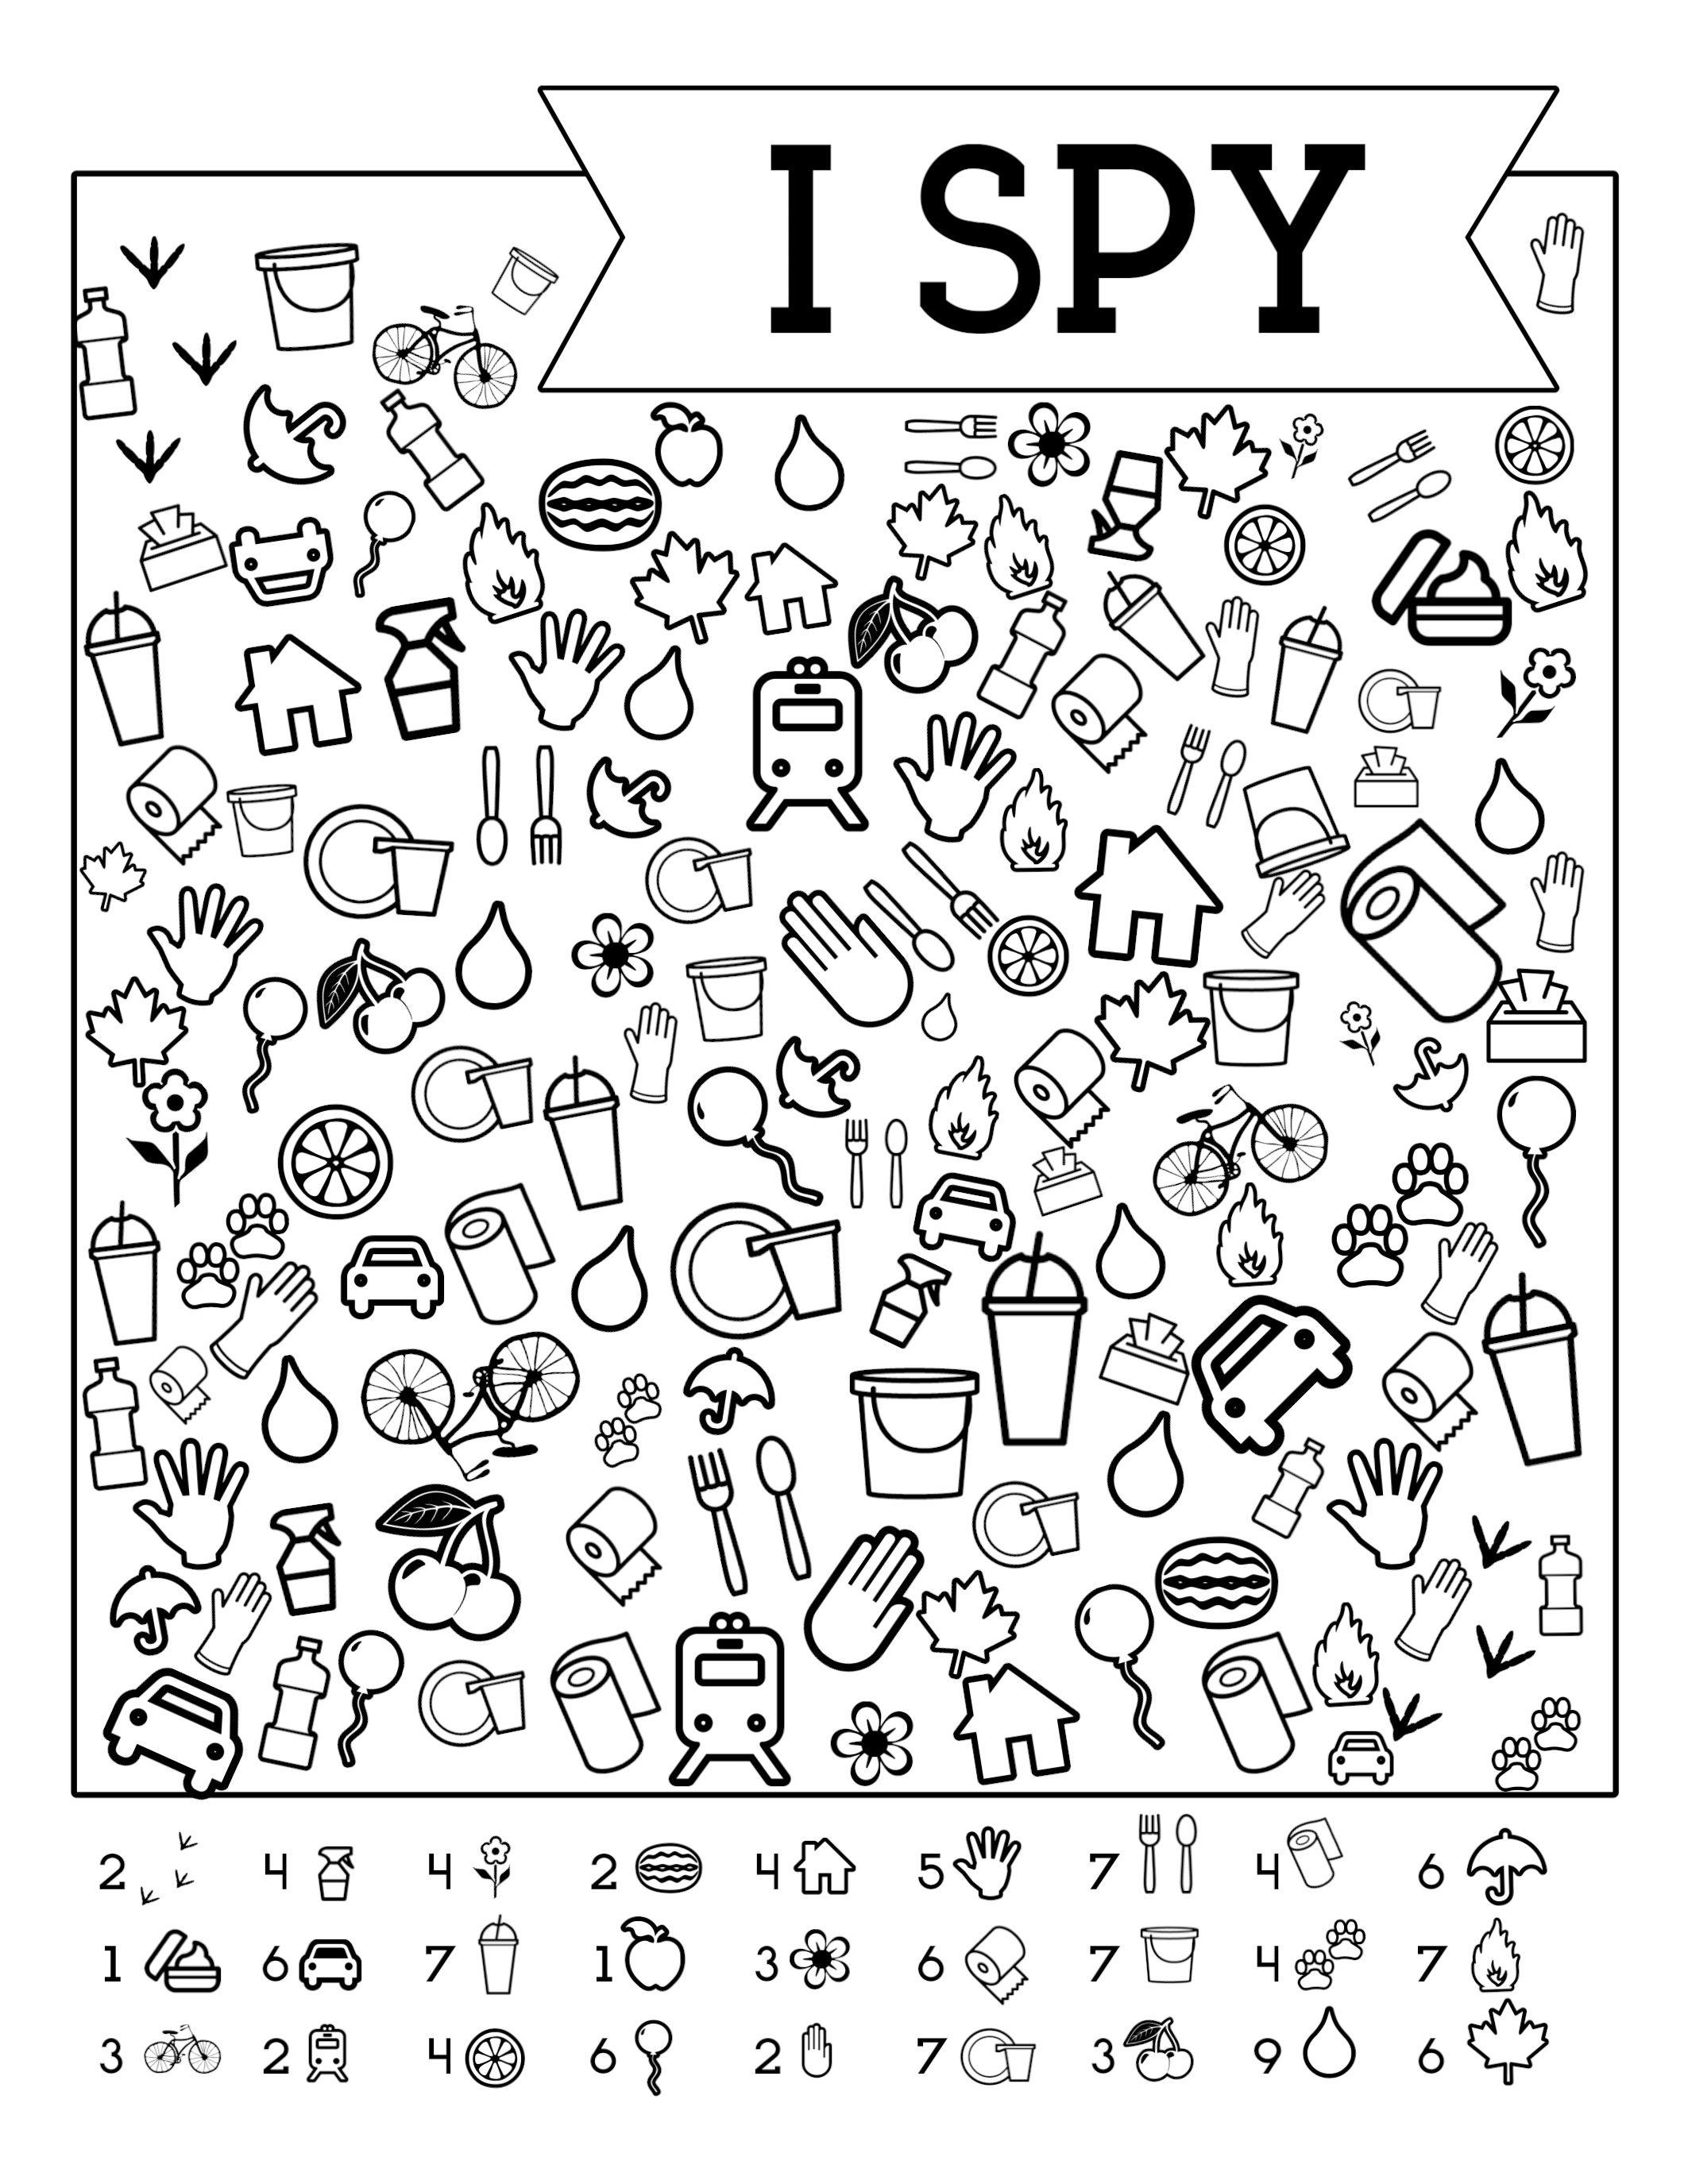 I-Spy-Free-Printable-Kids-Game   Spy School Camp   Spy Games For - Free Printable Hoy Sheets